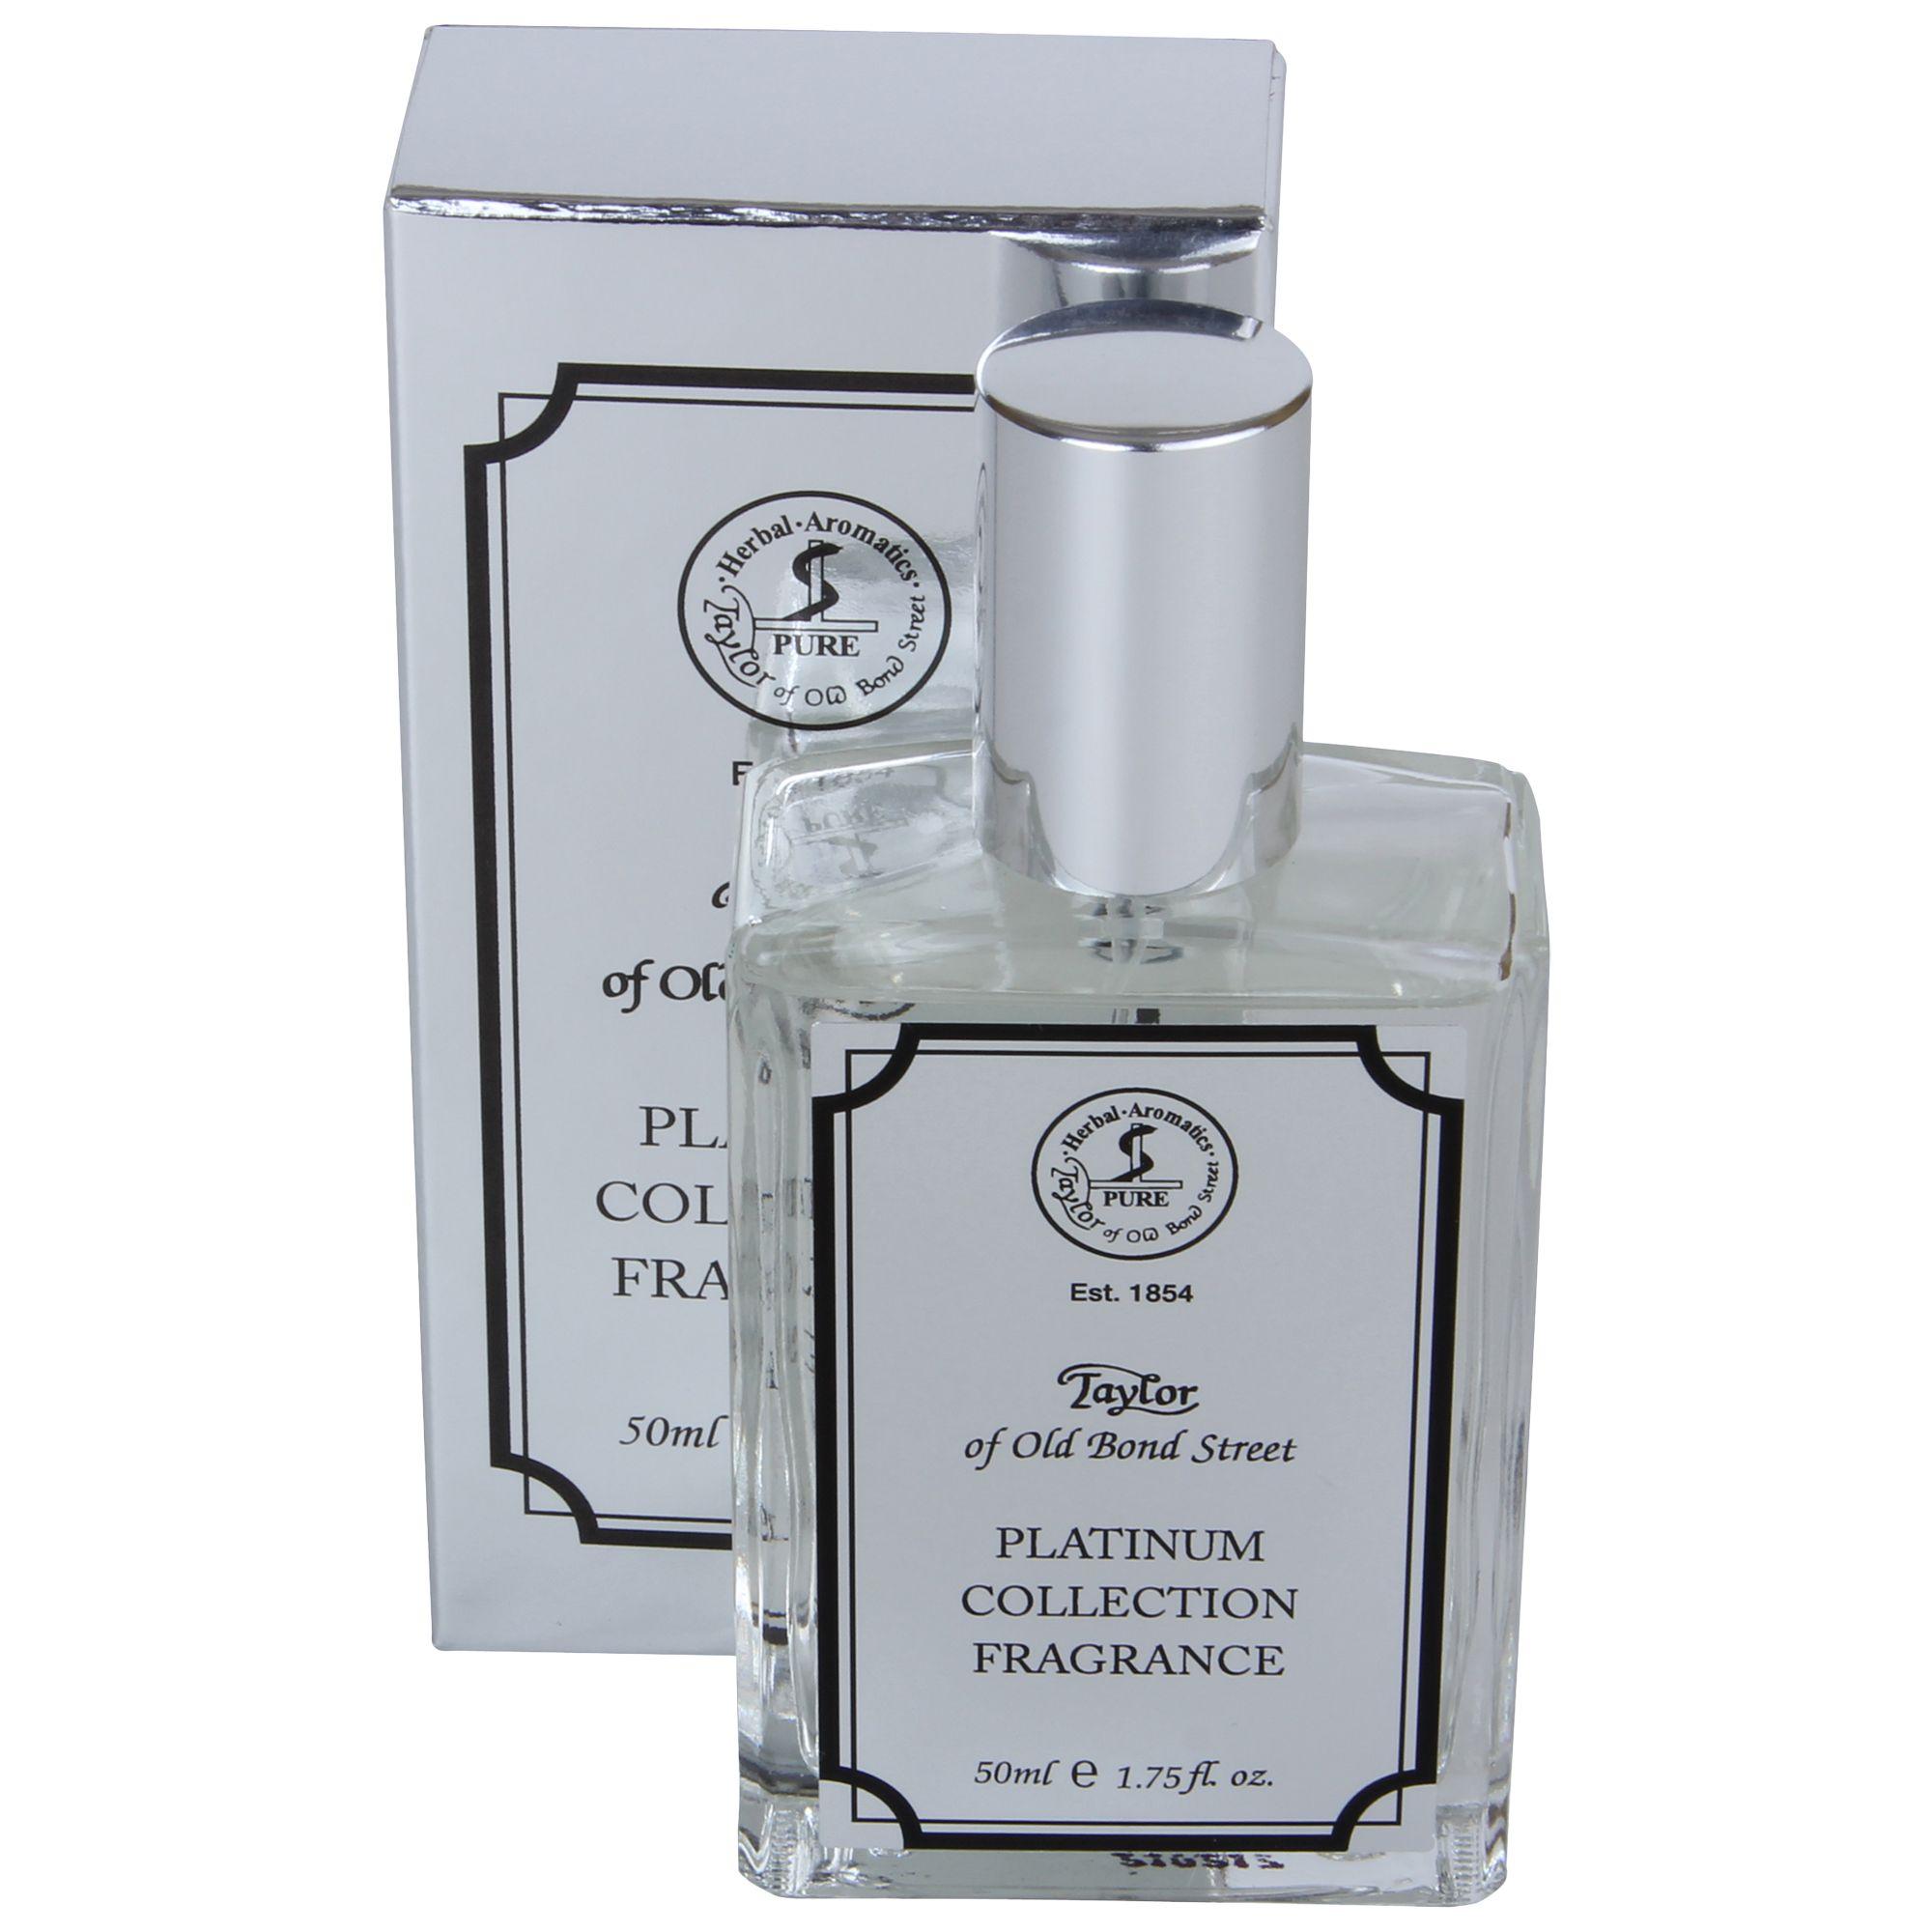 Taylor of Old Bond Street Taylor of Old Bond Street Platinum Collection Fragrance, 50ml